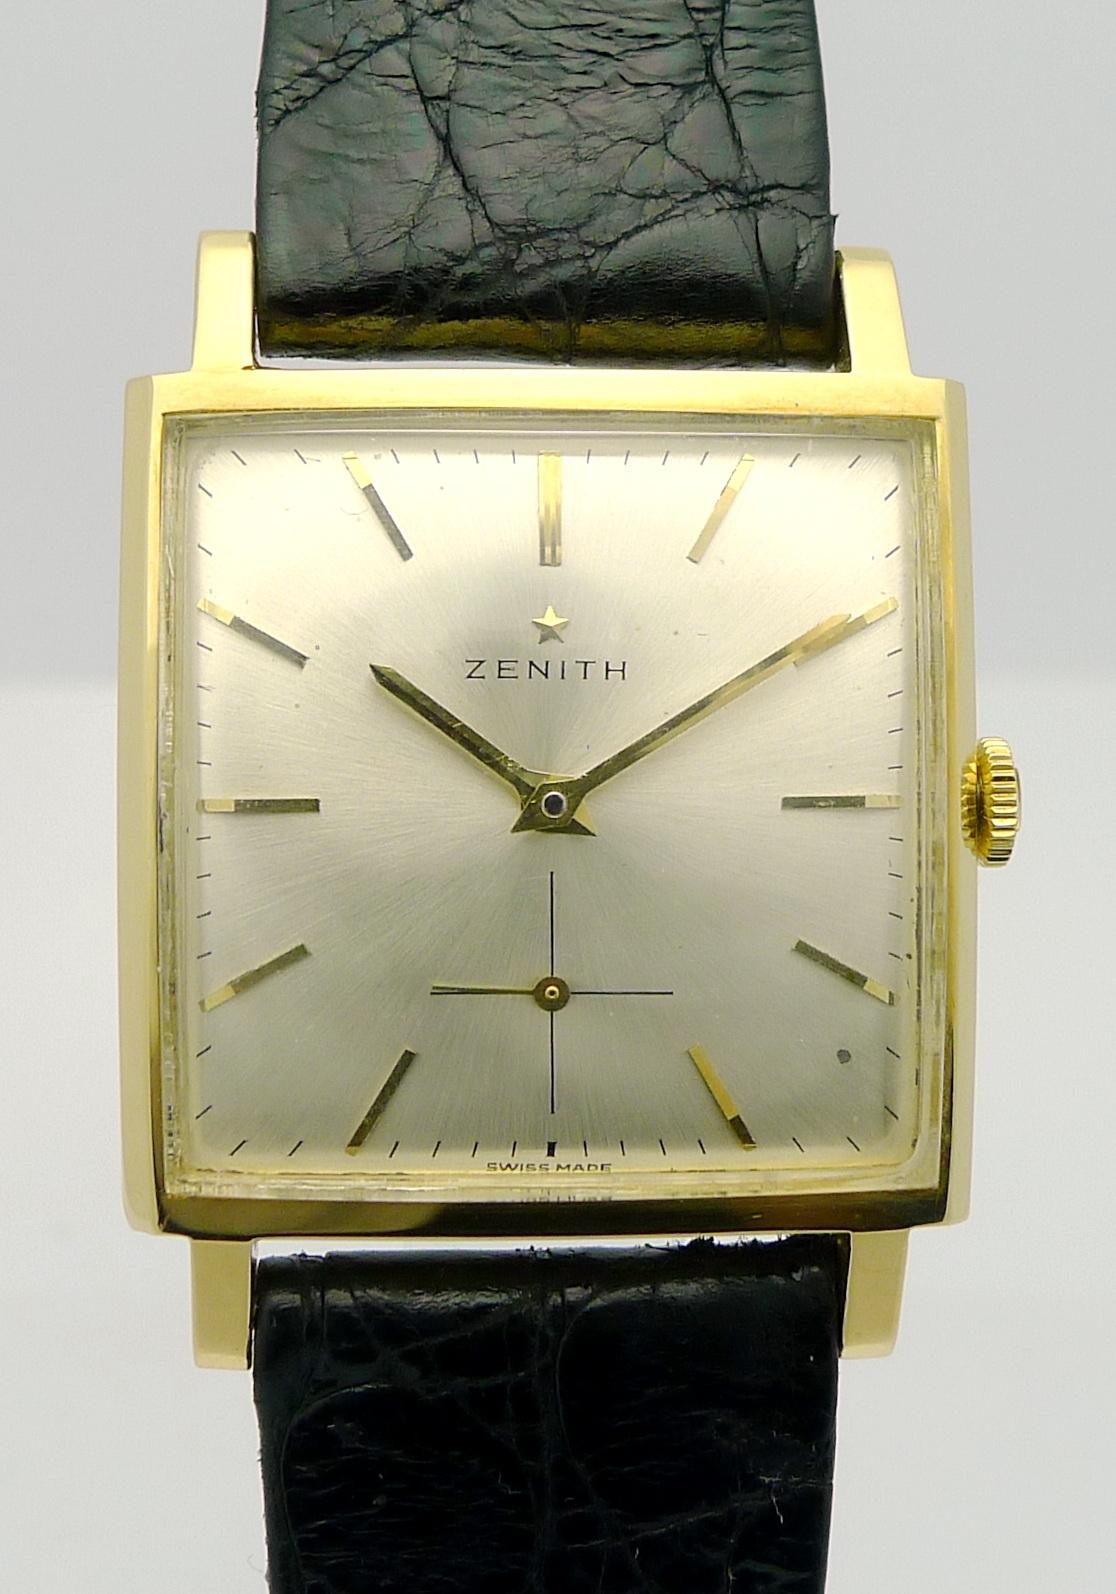 zenith 18ct gold herren armbanduhr klassiker aus den. Black Bedroom Furniture Sets. Home Design Ideas